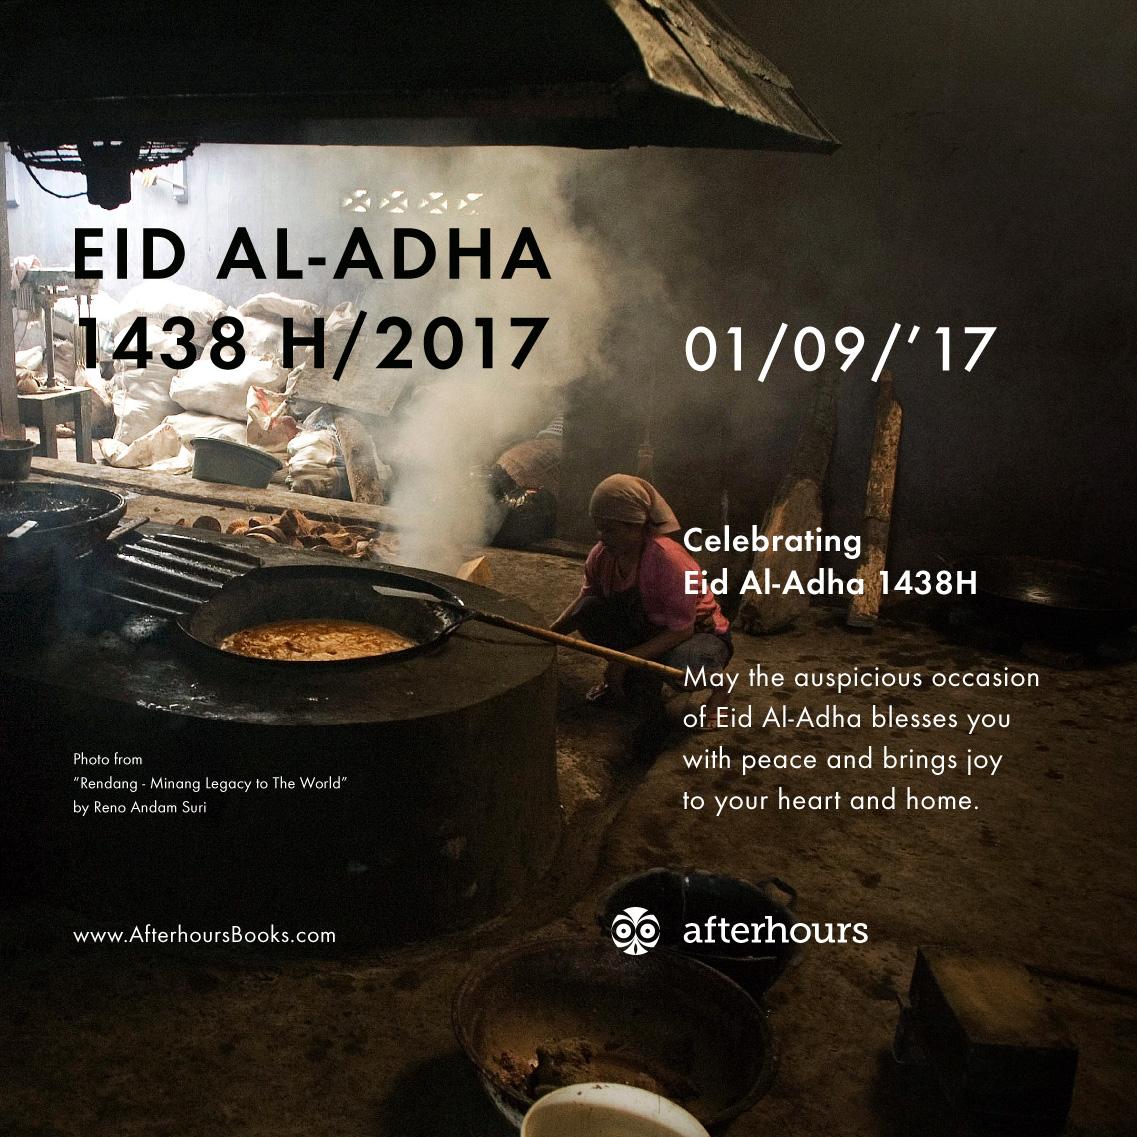 170825-eid-al-adha.jpg